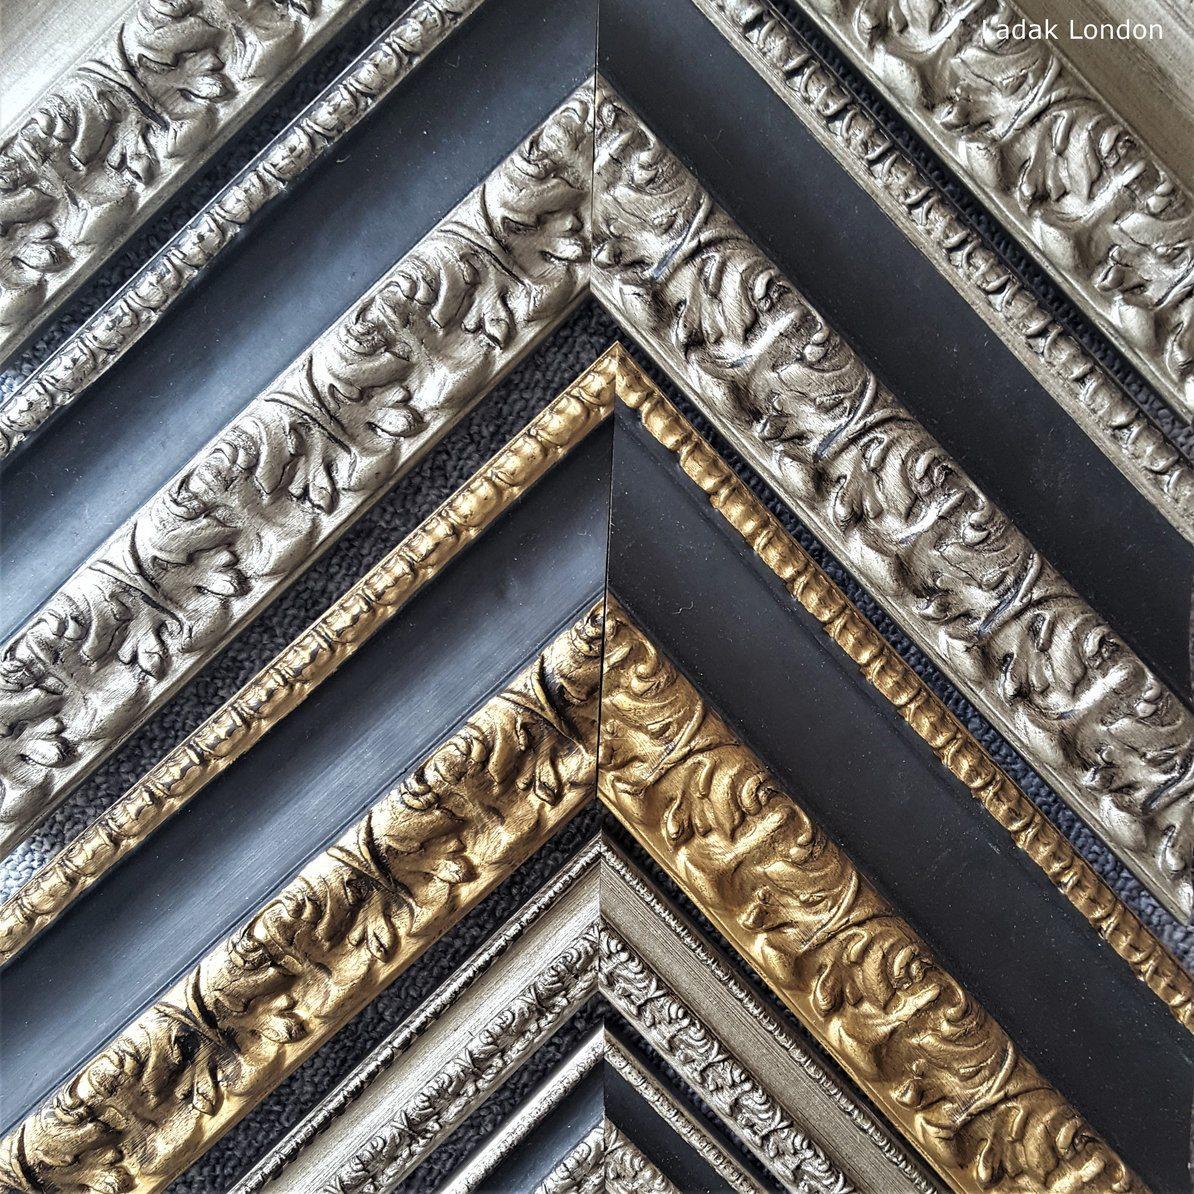 Ladak London Bespoke Picture Framers and Art Gallery F3 2018-07-17 16.48.20_wm_resize